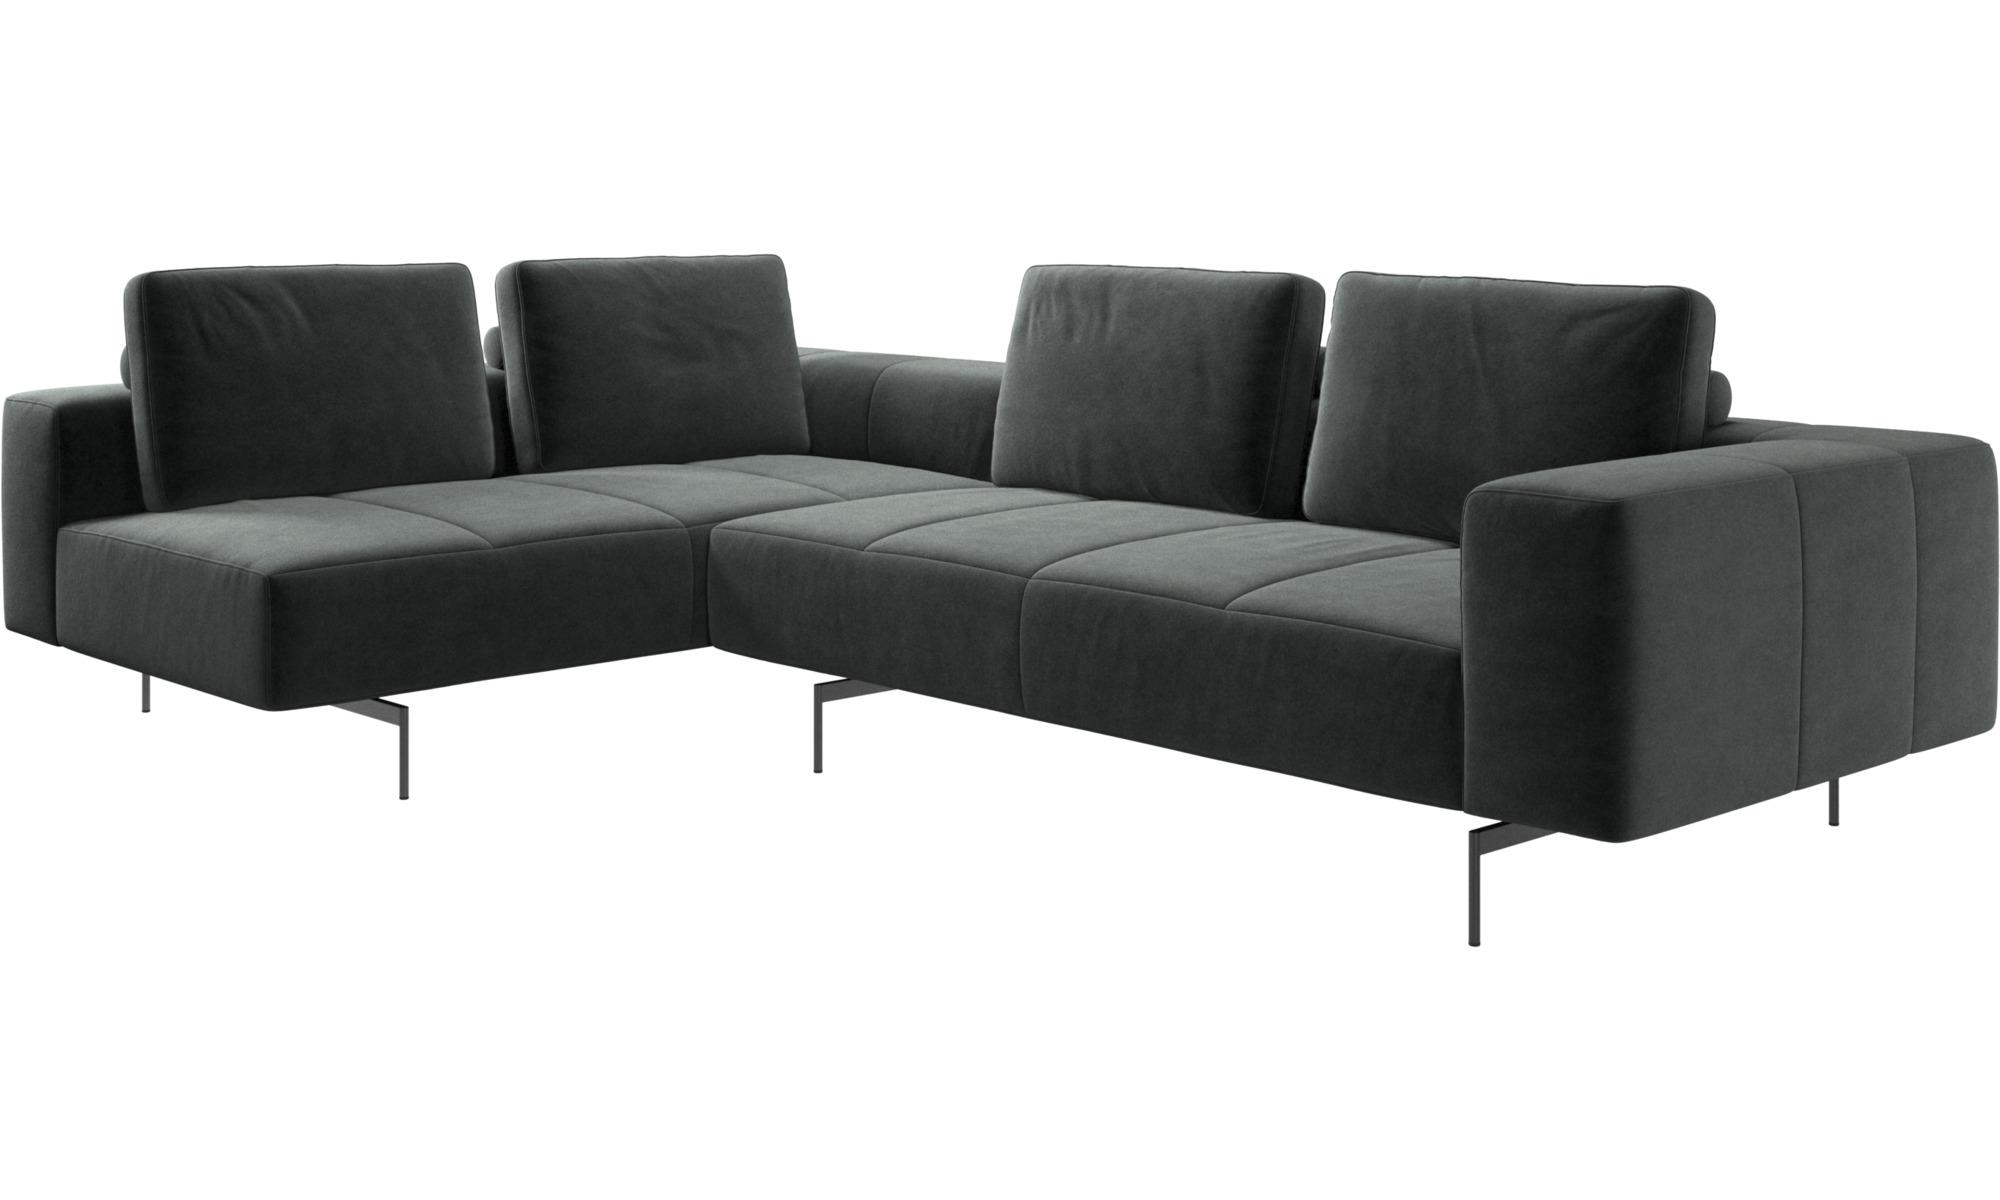 Corner sofas - Amsterdam corner sofa with lounging unit ...